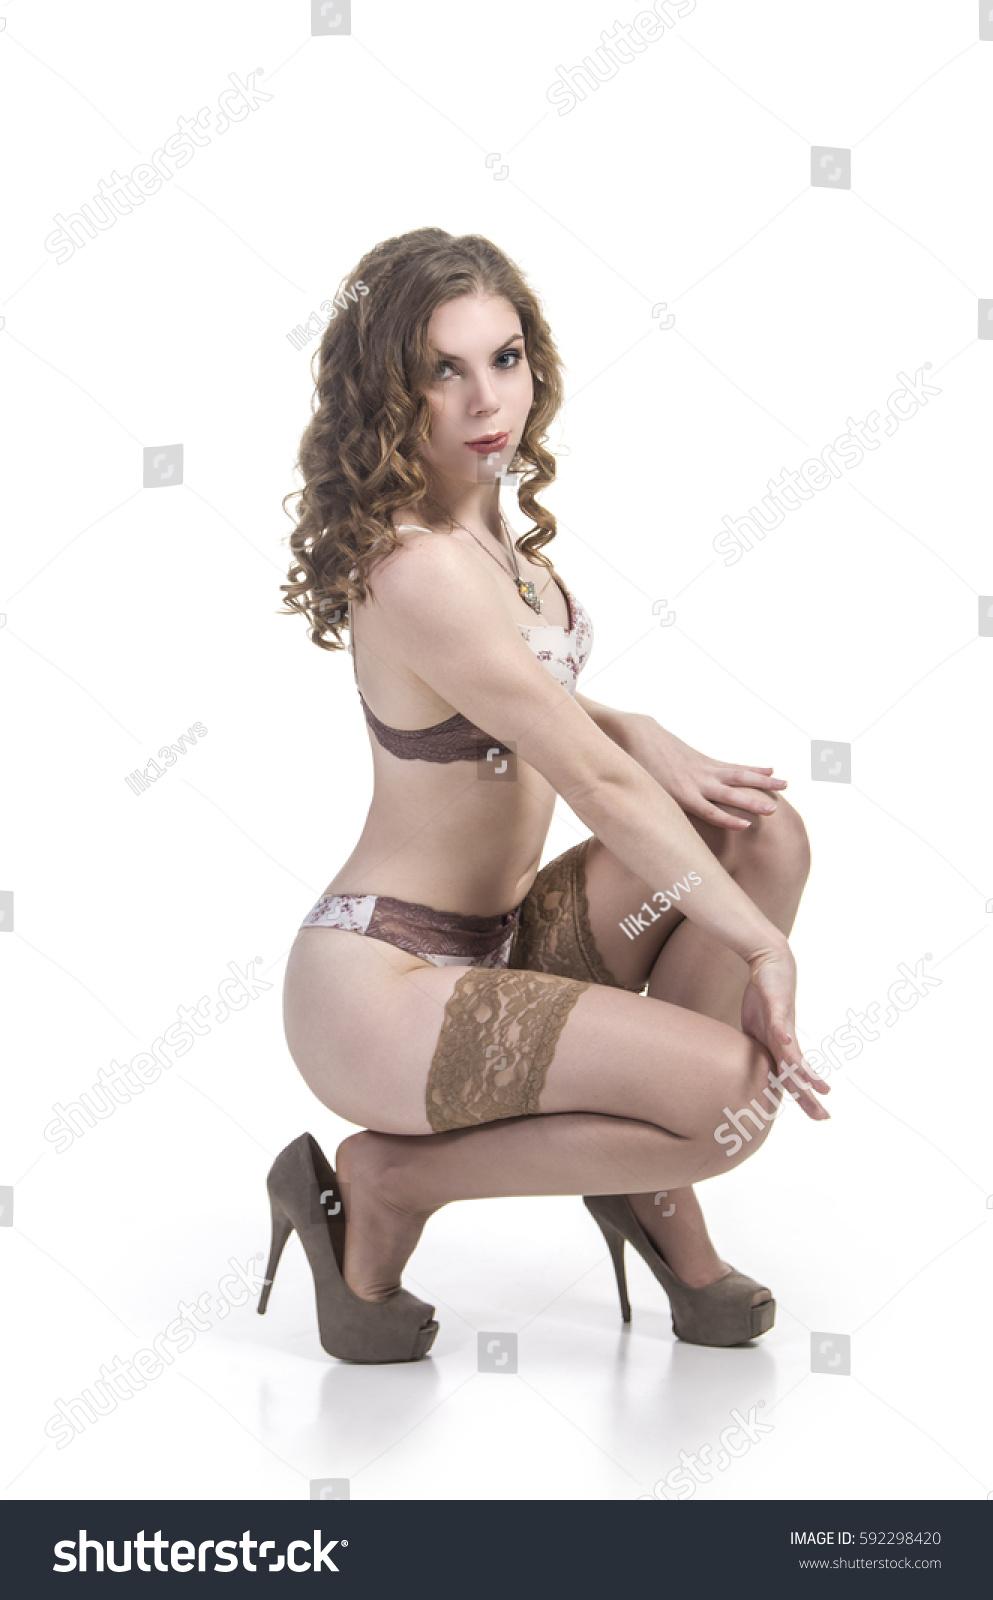 Sexy Girl Underwear Stockings Smiling Posing Stock Photo